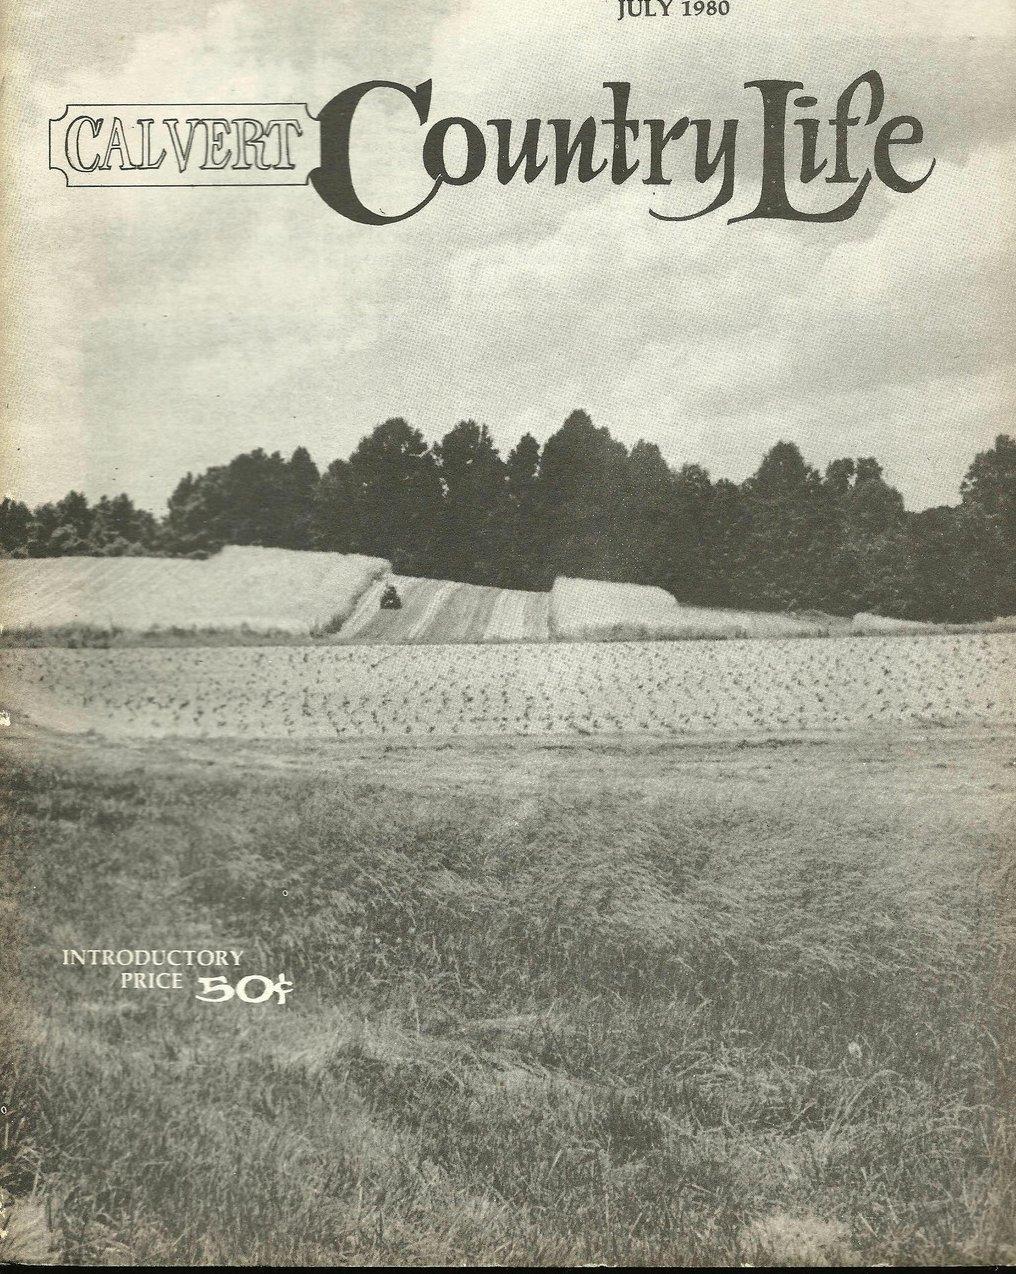 Calvert Country Life Vol 1 No 2 July 1980 Vintage Magazine